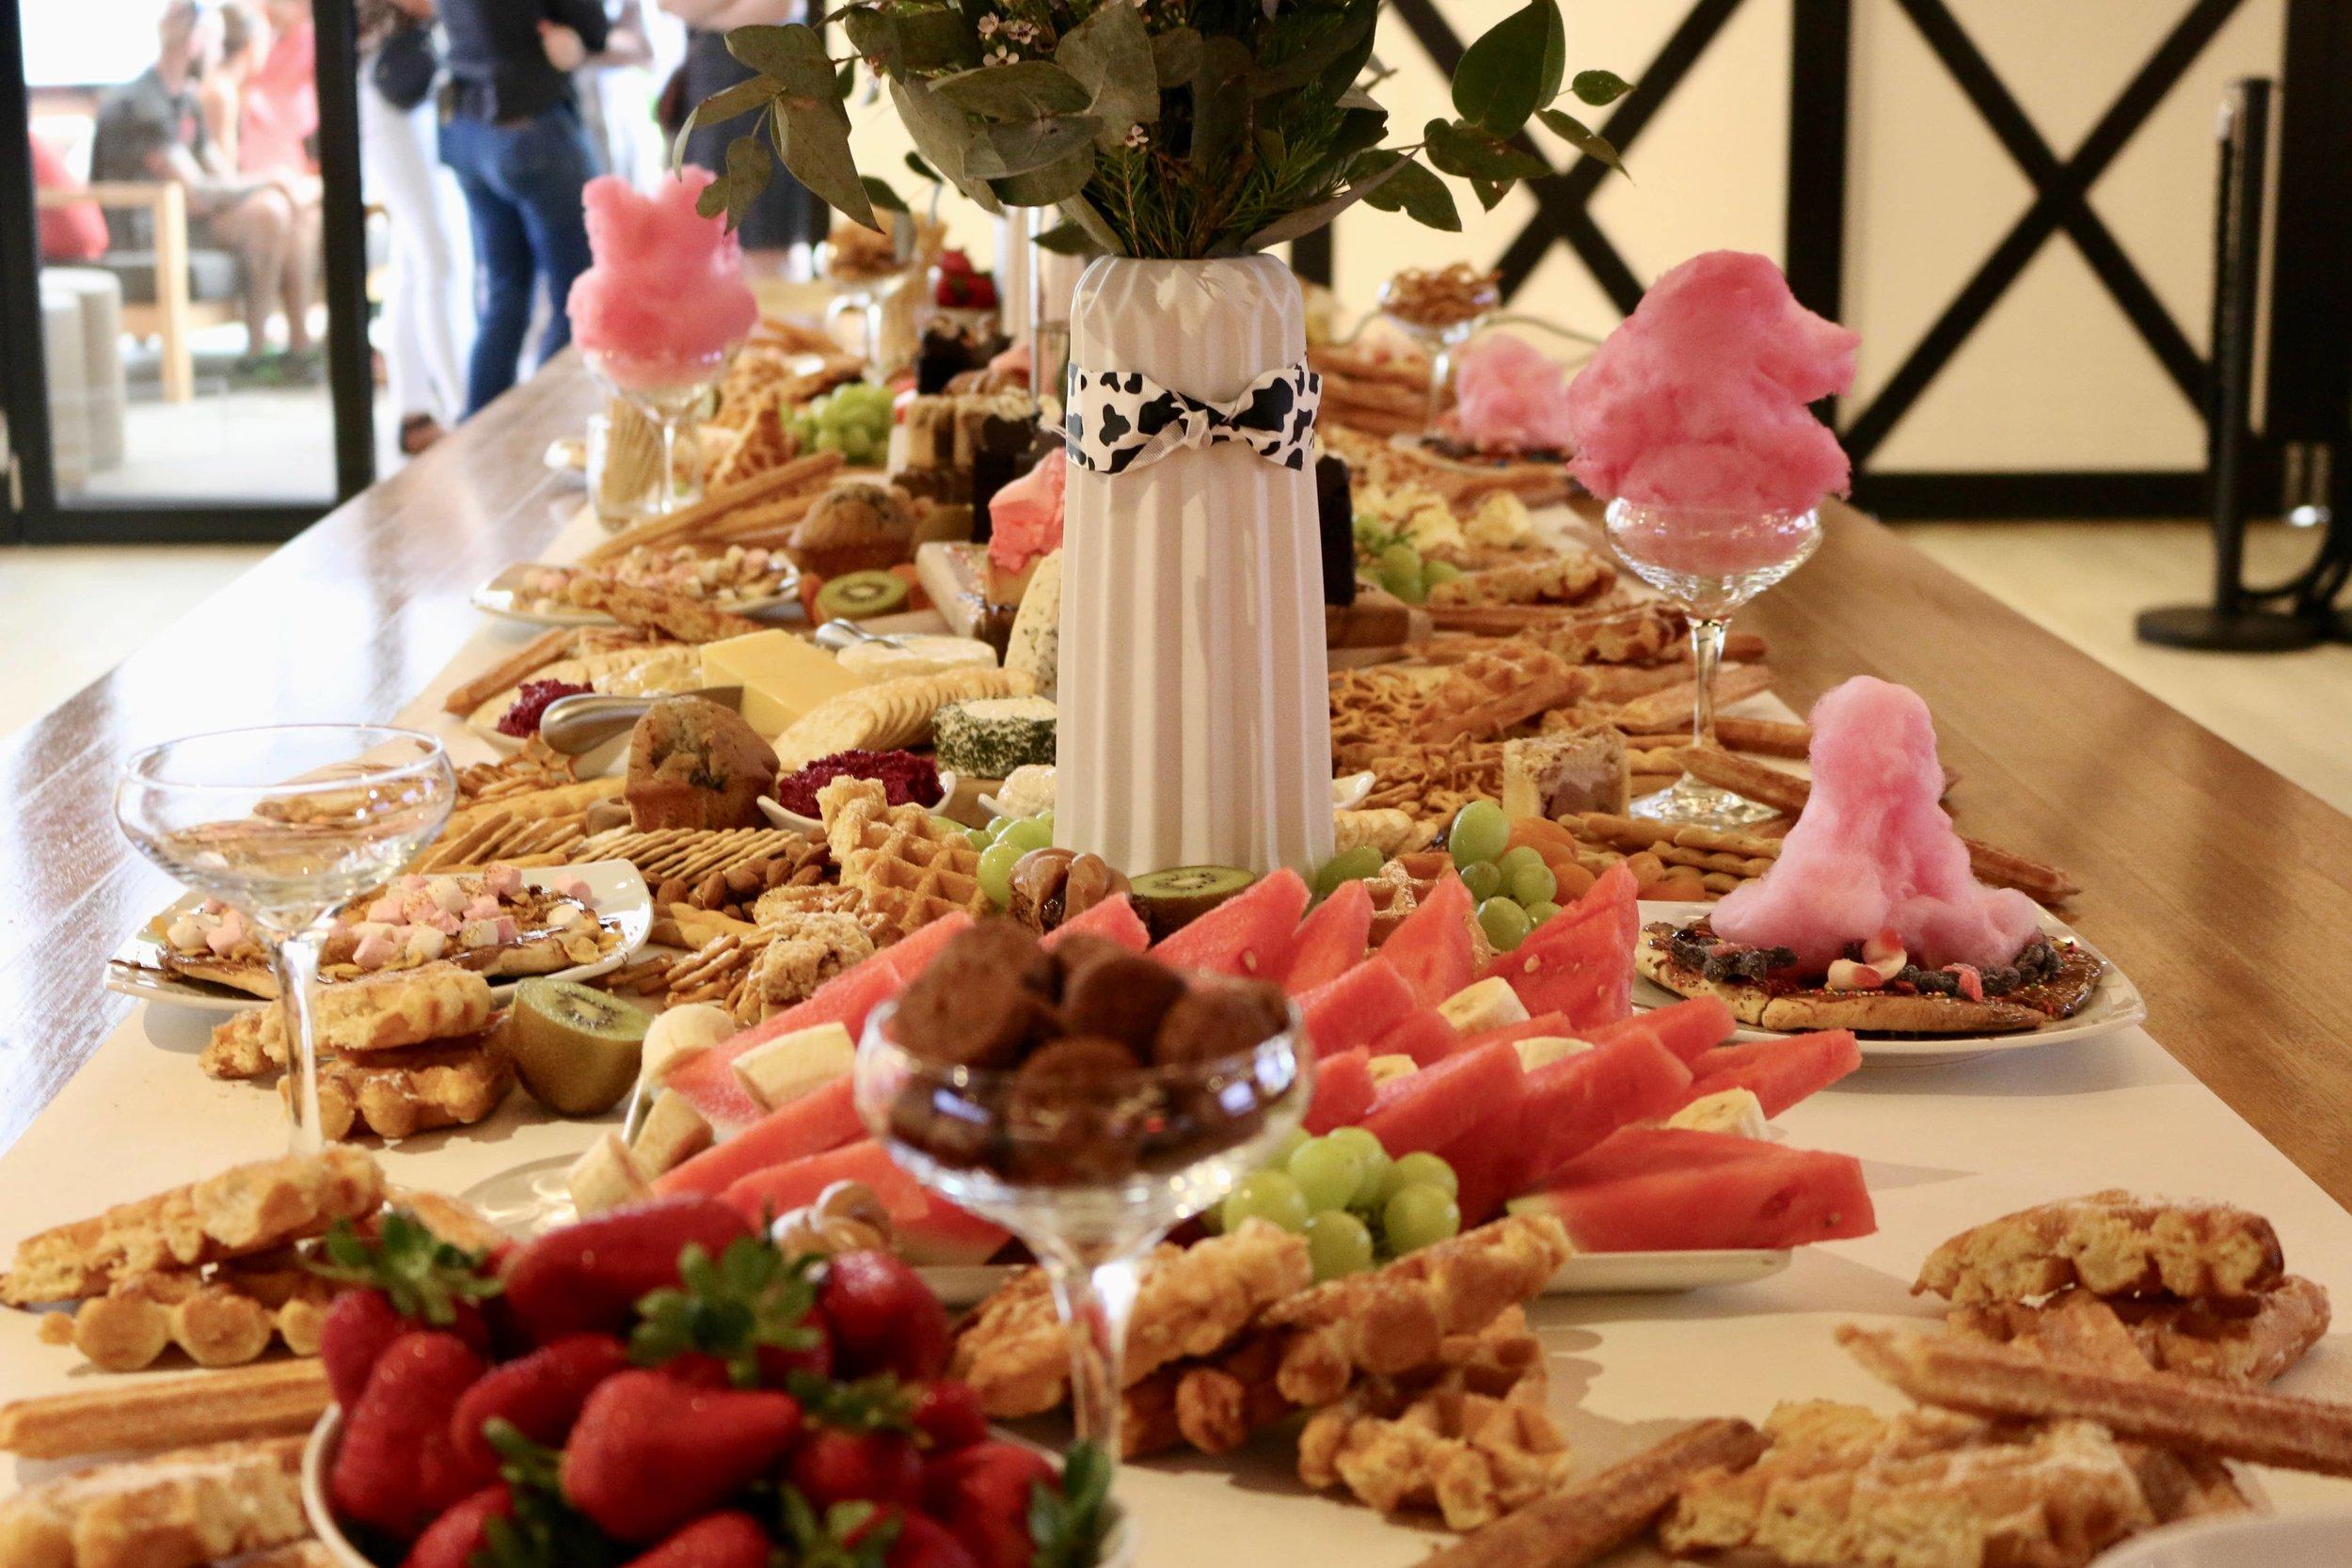 Sweet-treat-tasting-table.jpg